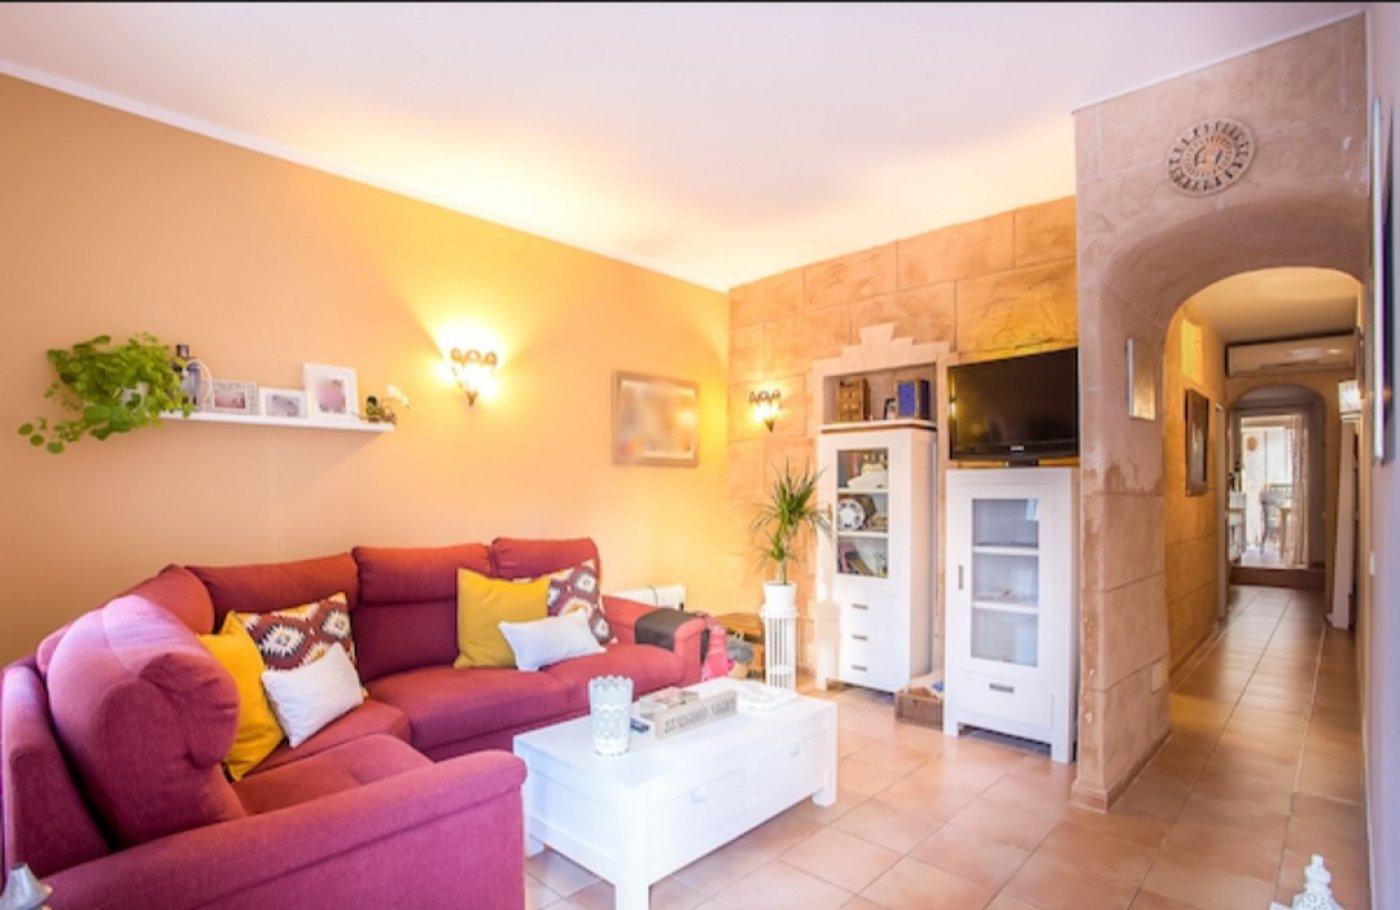 Ground Floor Apartment for sale in Santa Catalina, Palma de Mallorca